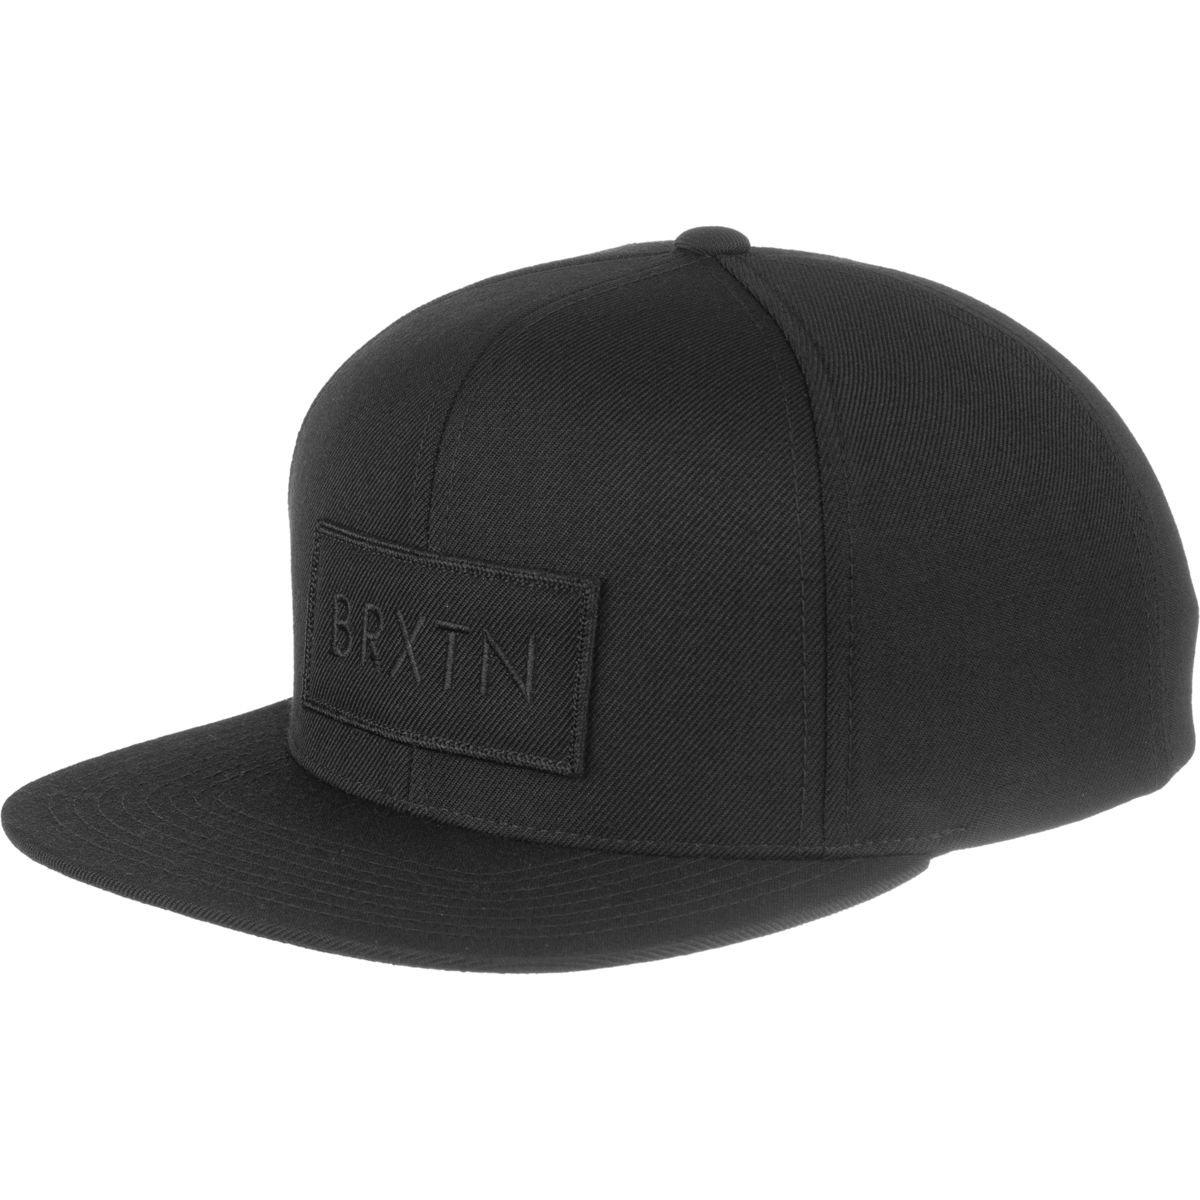 80ef27b0f38 Amazon.com  Brixton - Unisex-Adult Rift Snapback Hat